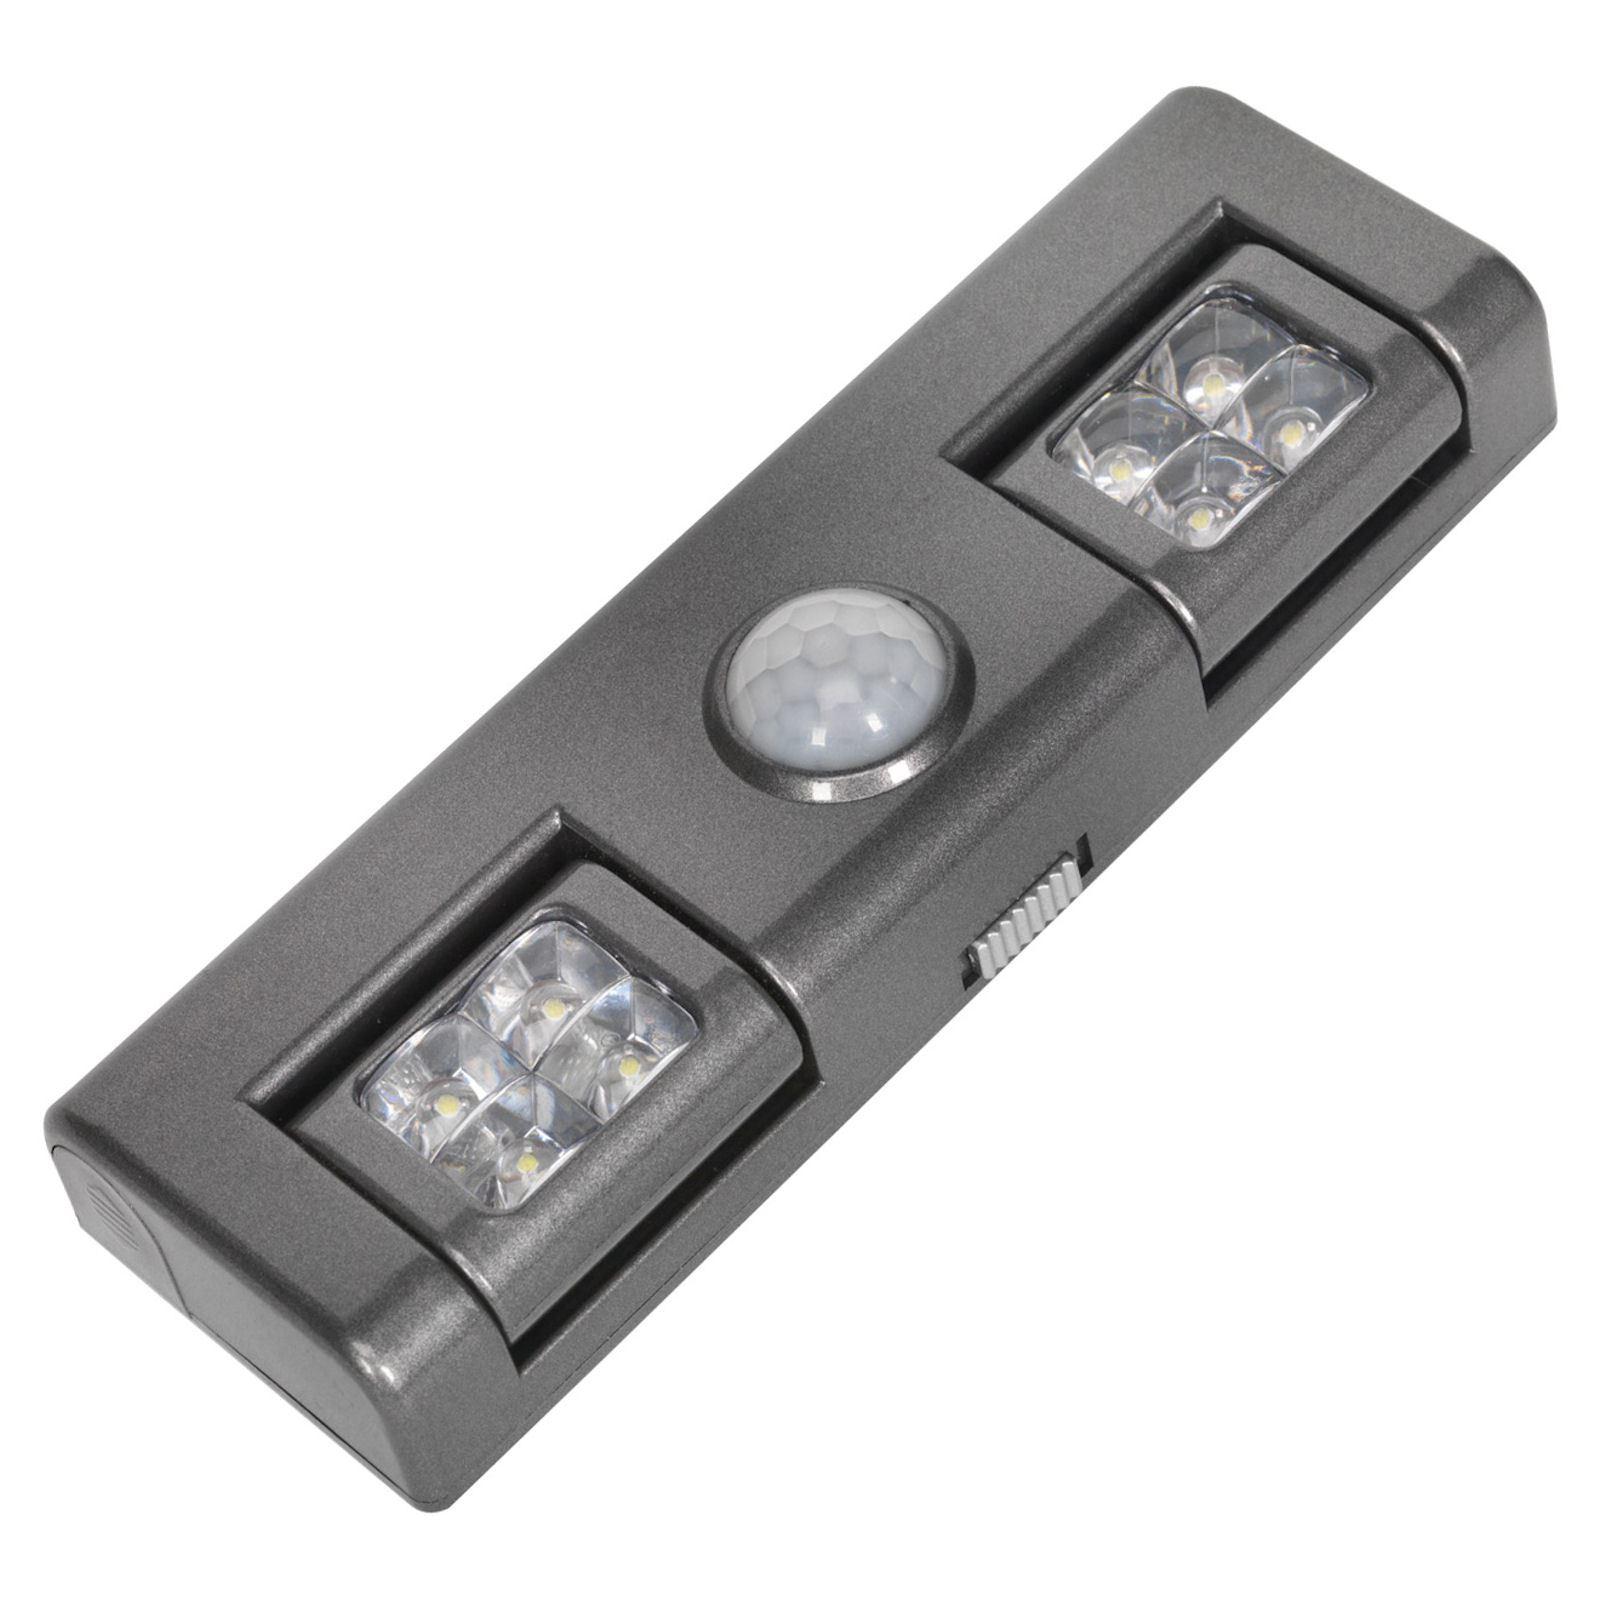 Sealey GL93 8 LED Automatic Light PIR Motion Sensor Garden